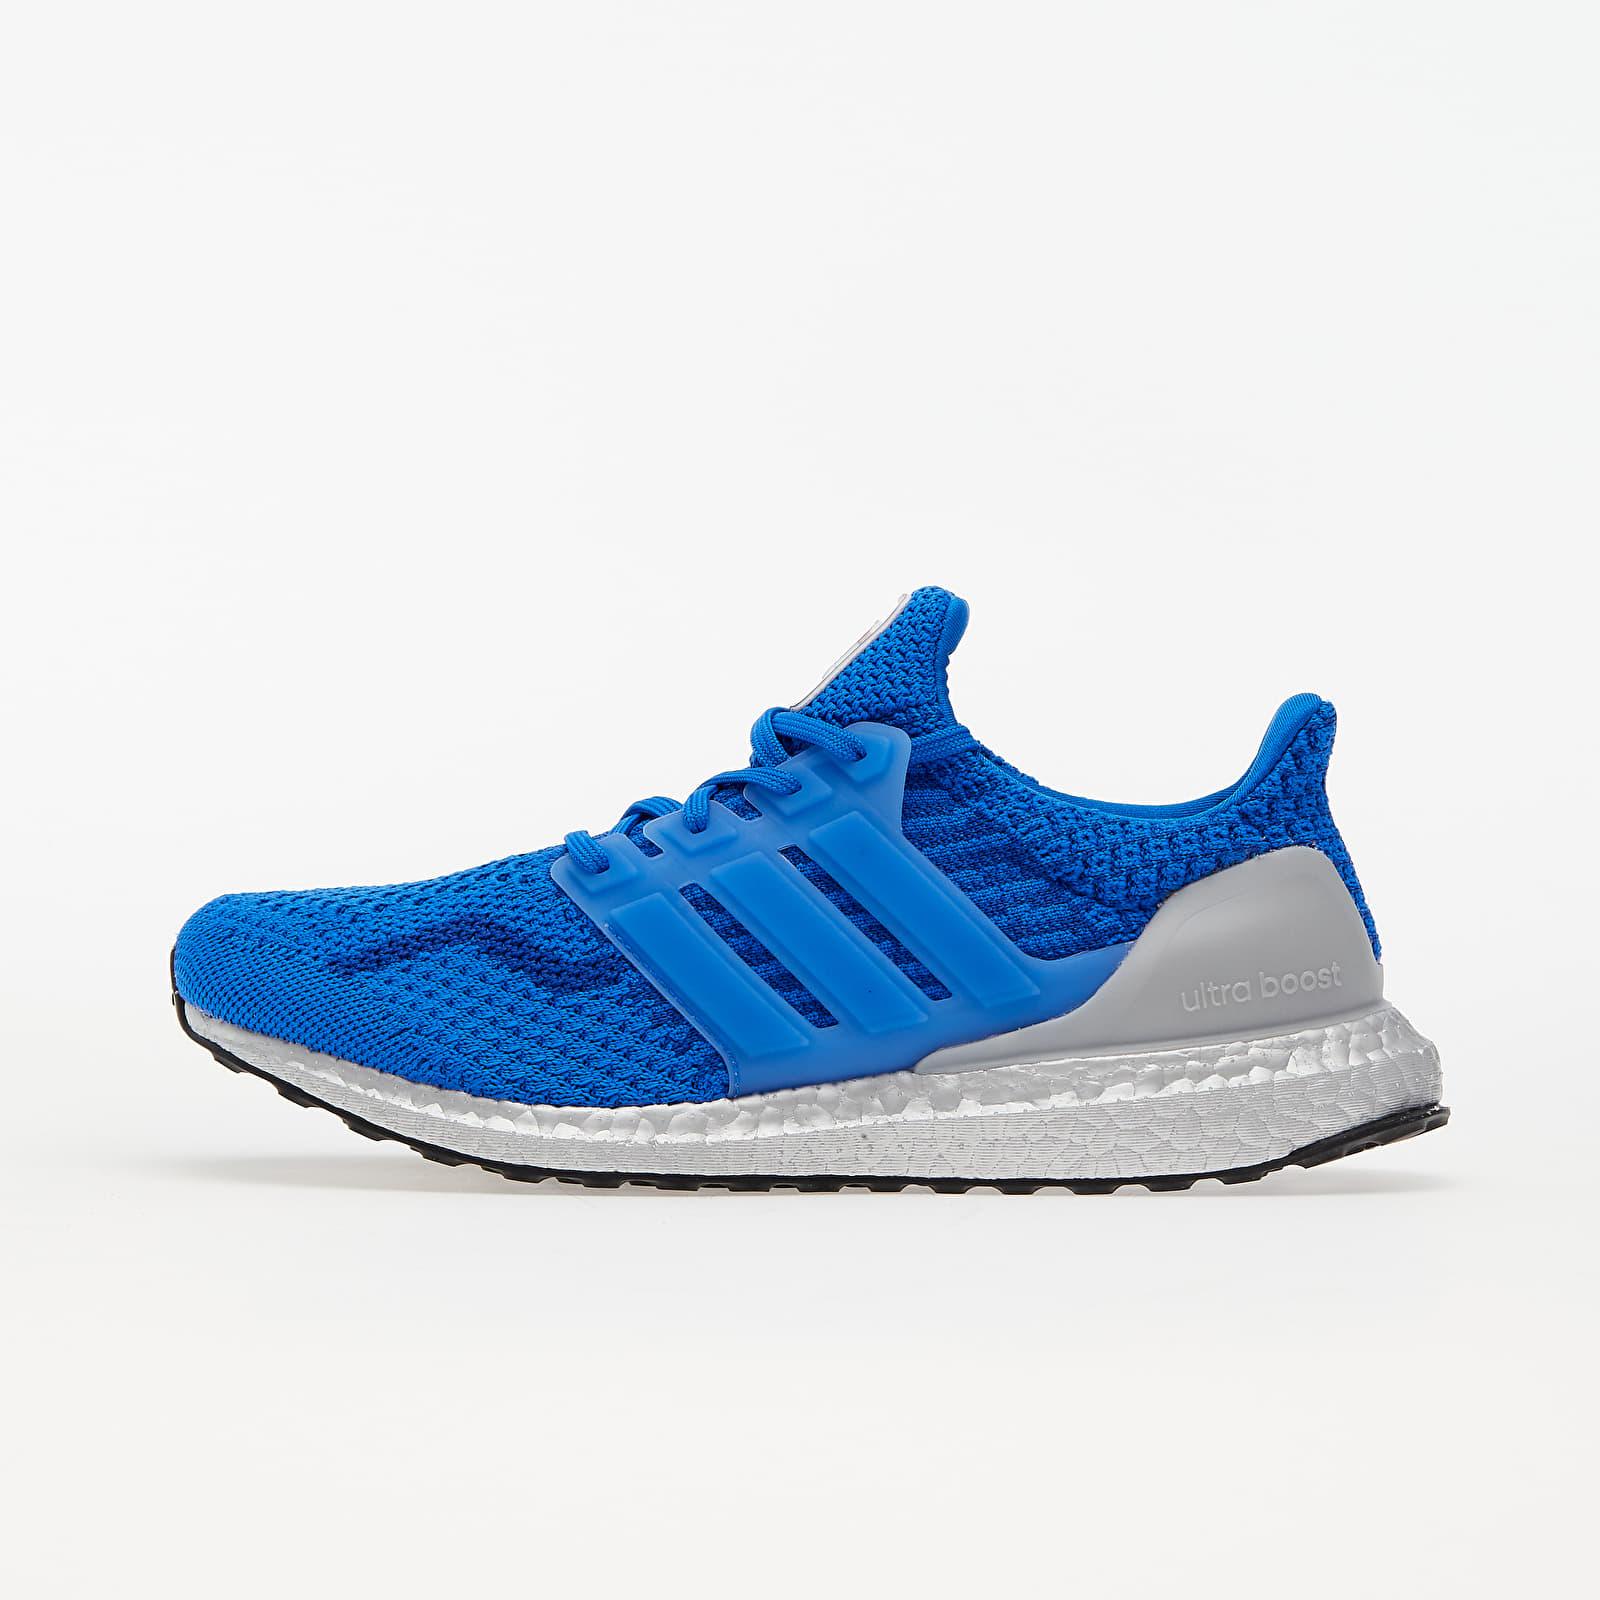 adidas UltraBOOST 5.0 DNA Foot Blue/ Foot Blue/ Royal Blue EUR 40 2/3